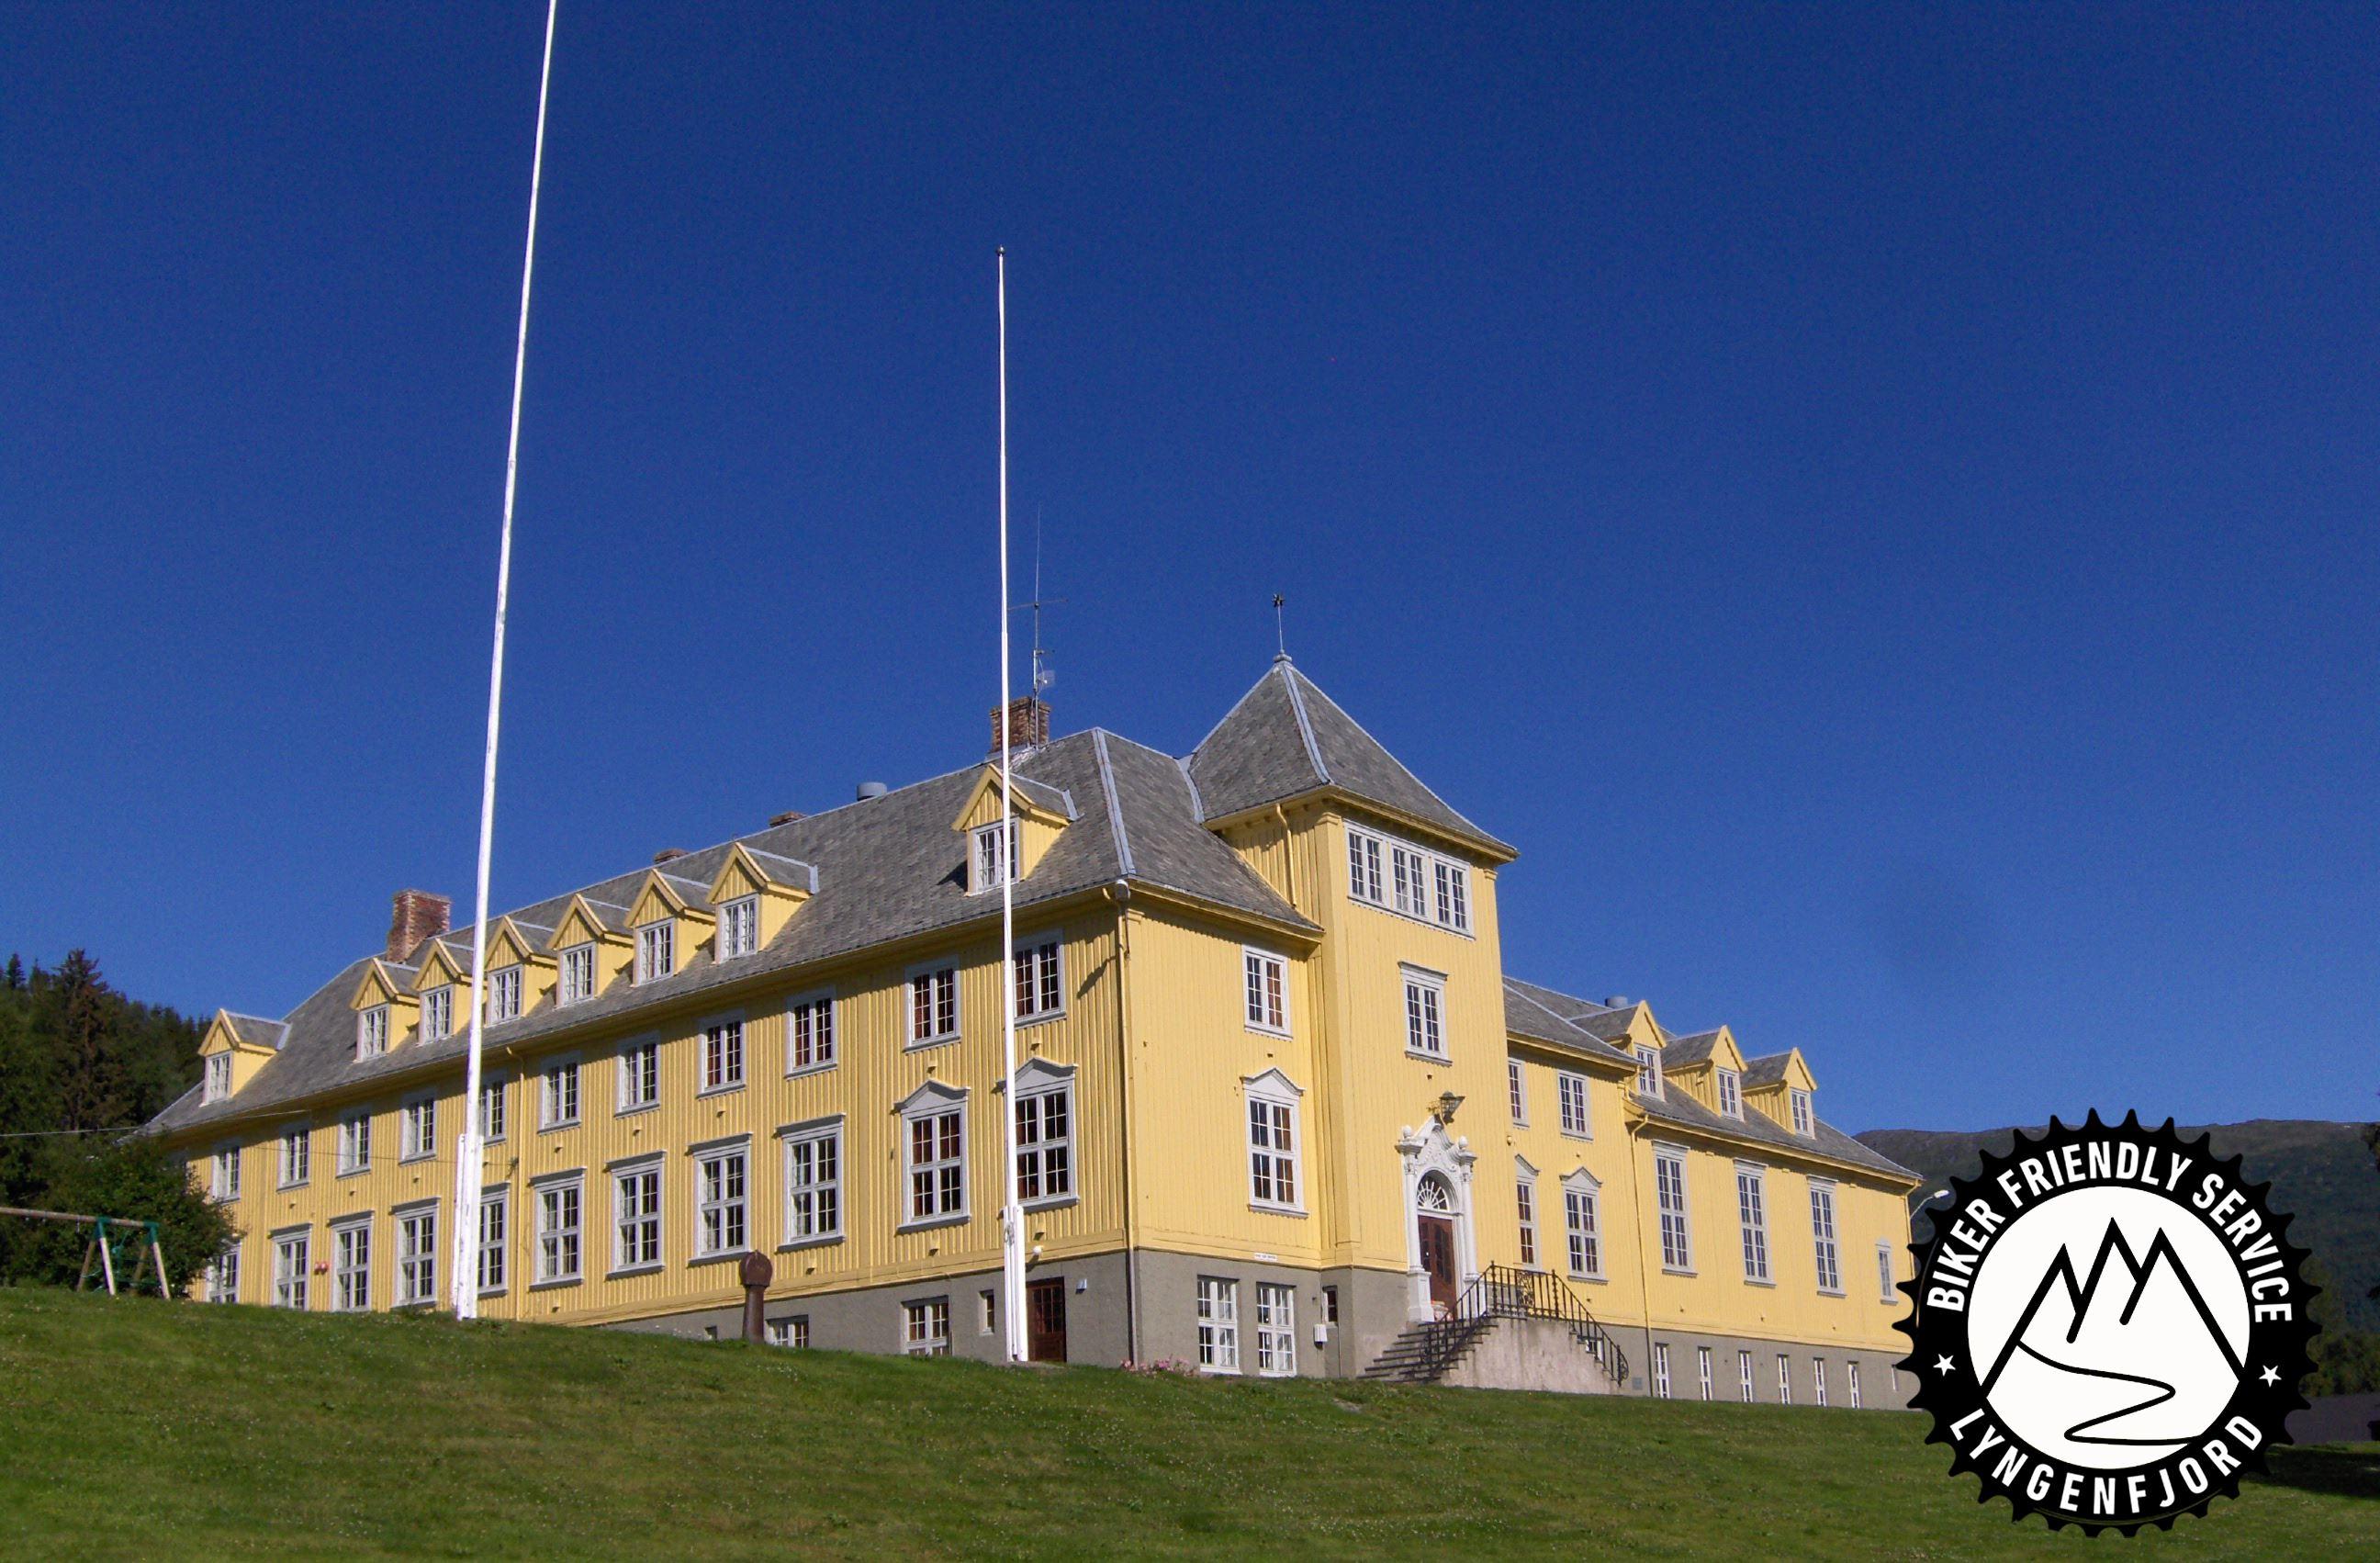 Solhov Gjestehus